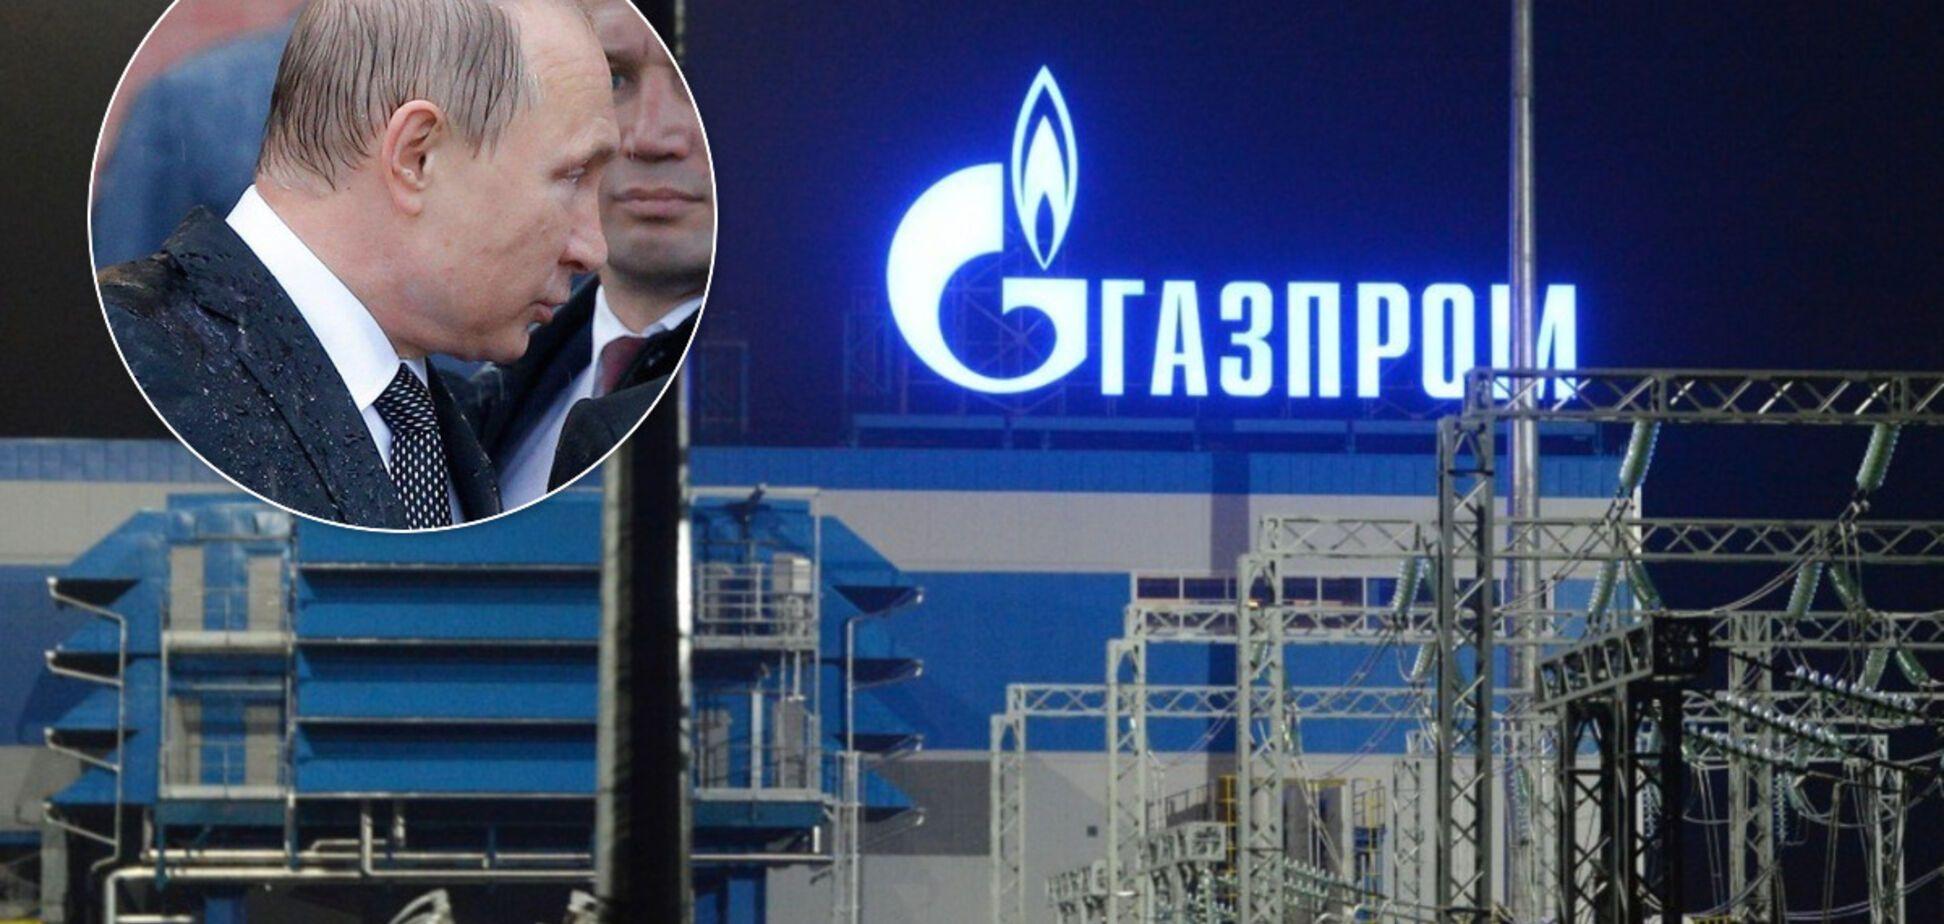 'Газпром' заключил крупнейший контракт на поставку газа самому себе